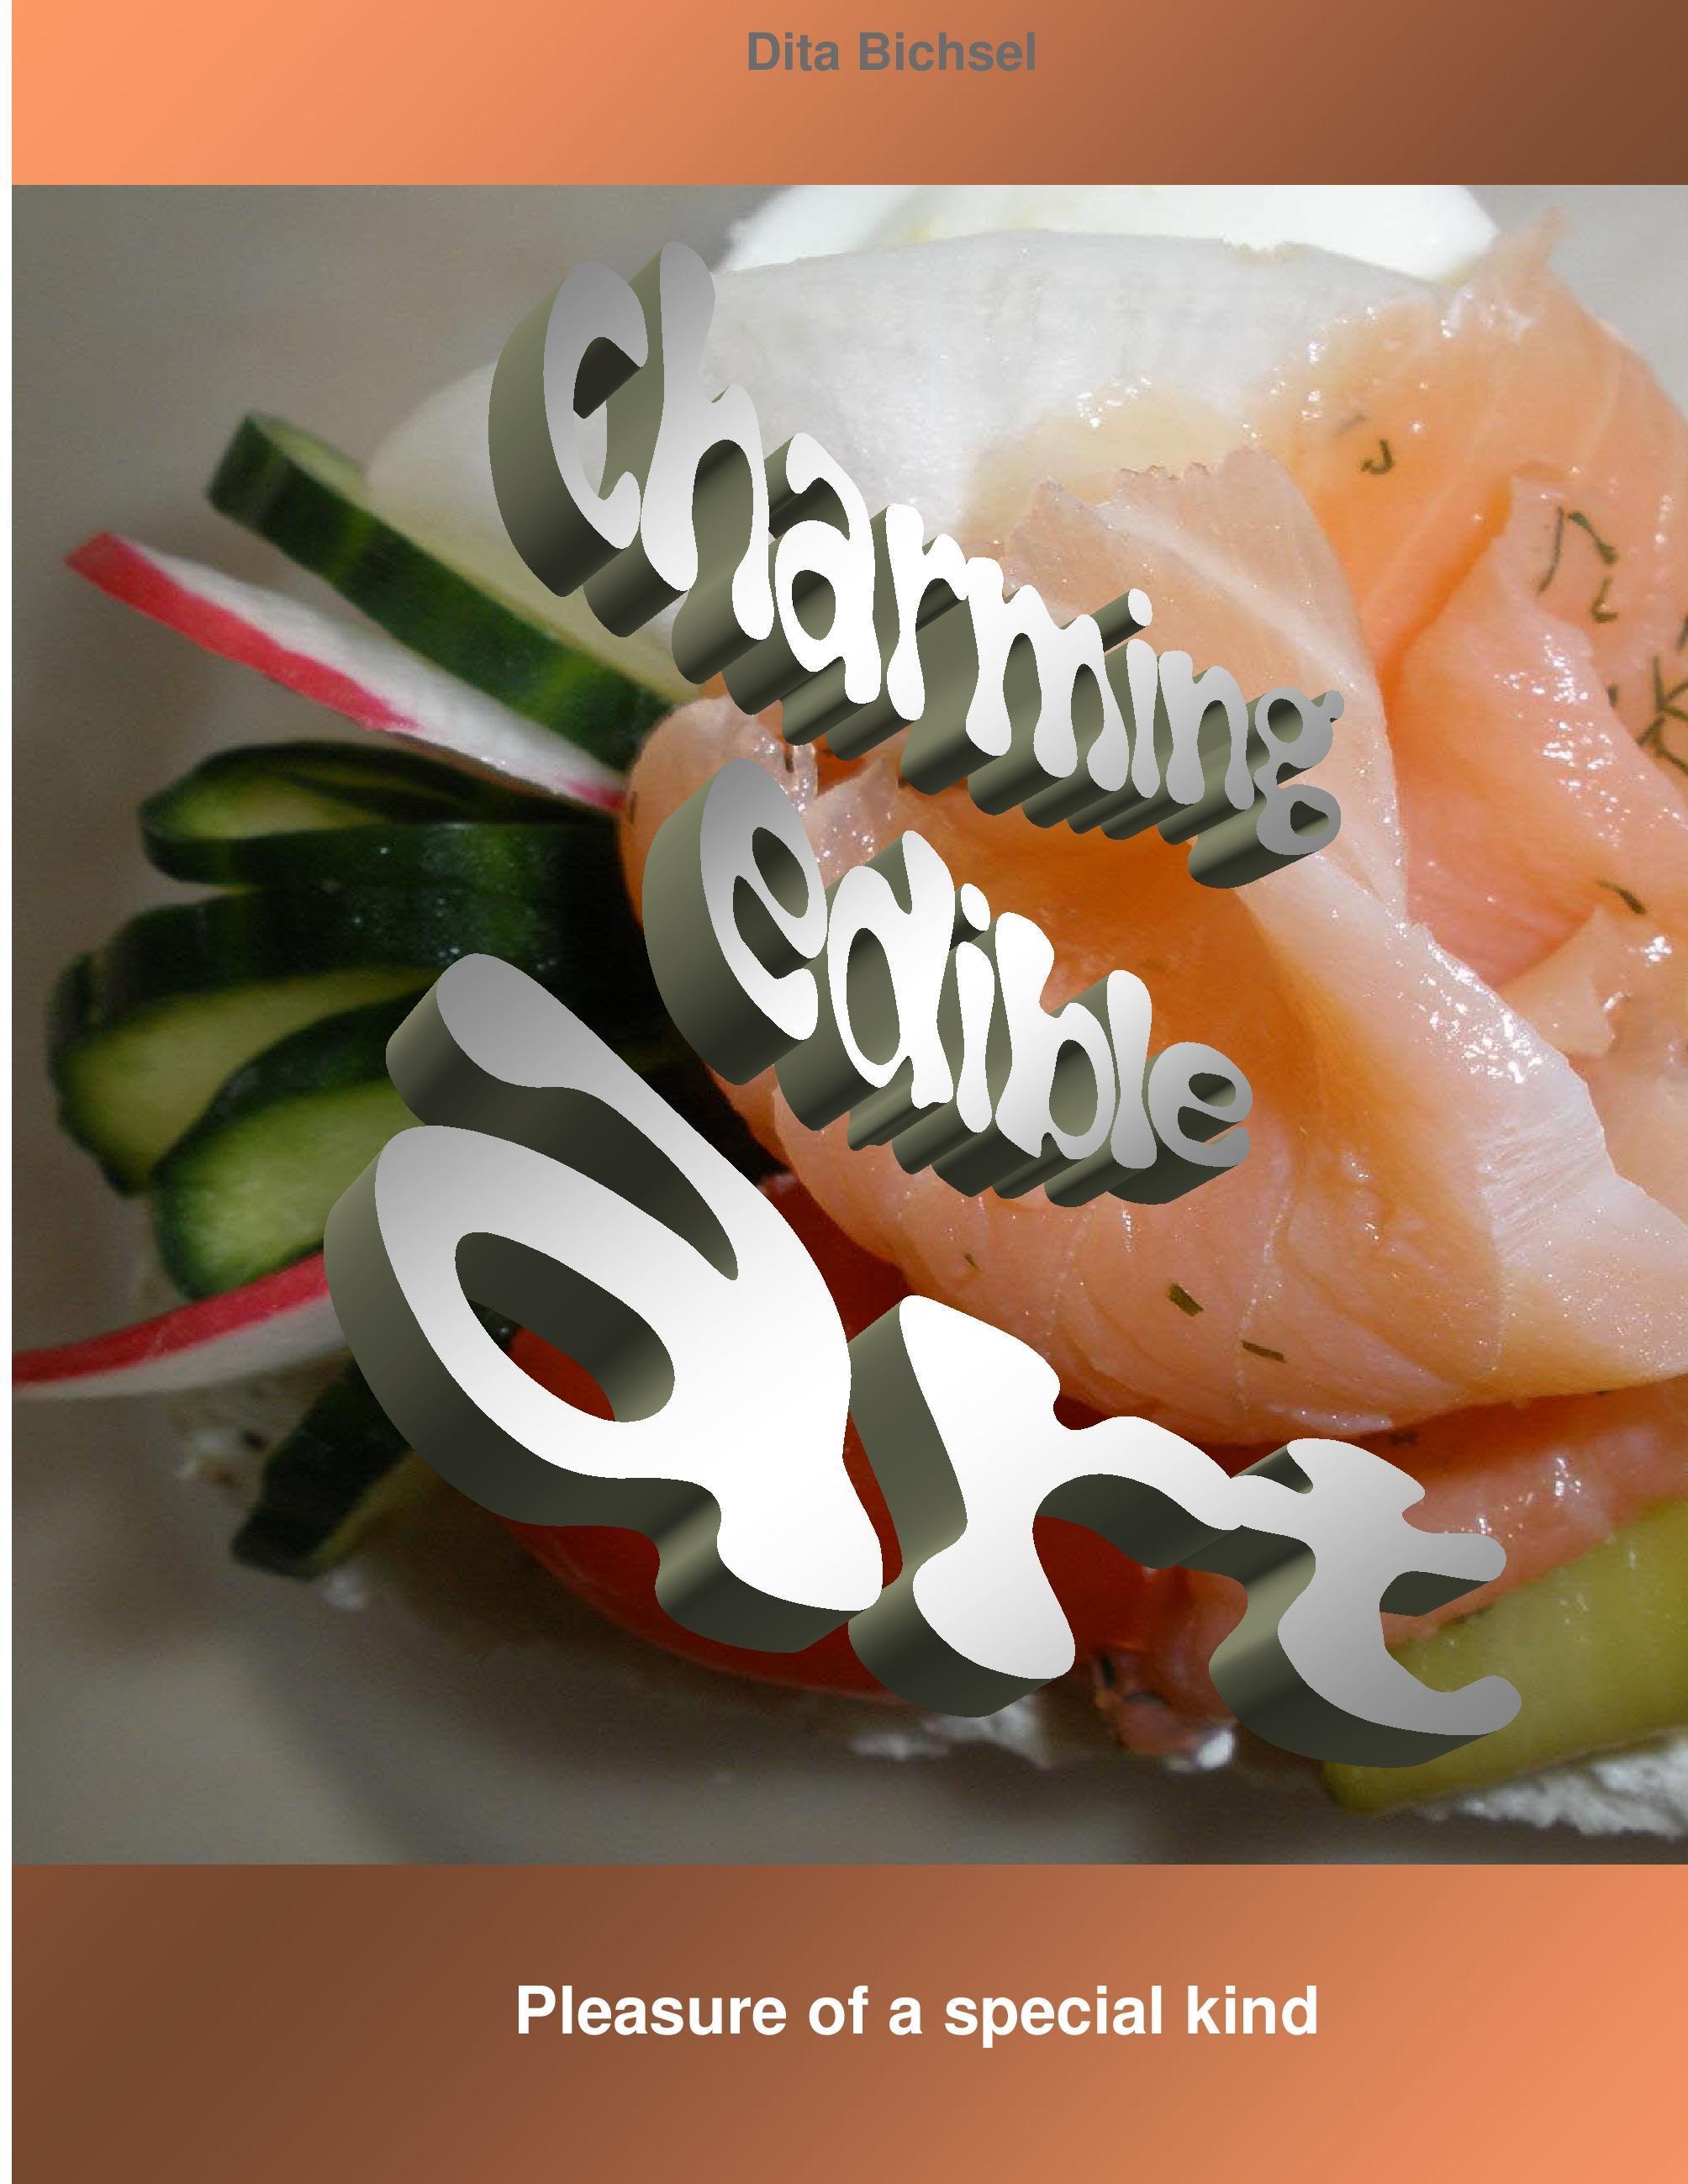 charming edible art